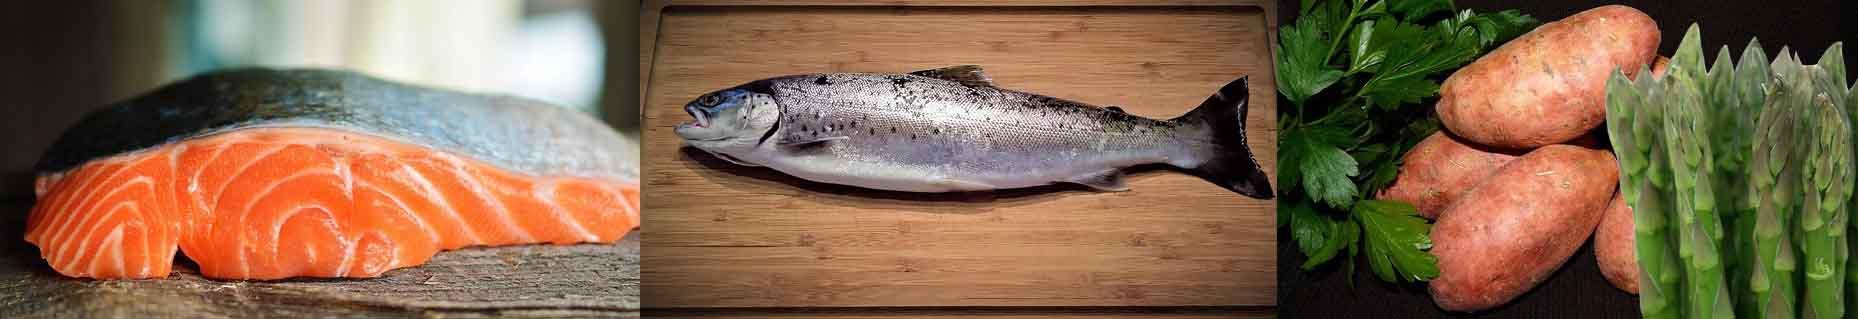 croquettes chien saumon truite patate douce asperge